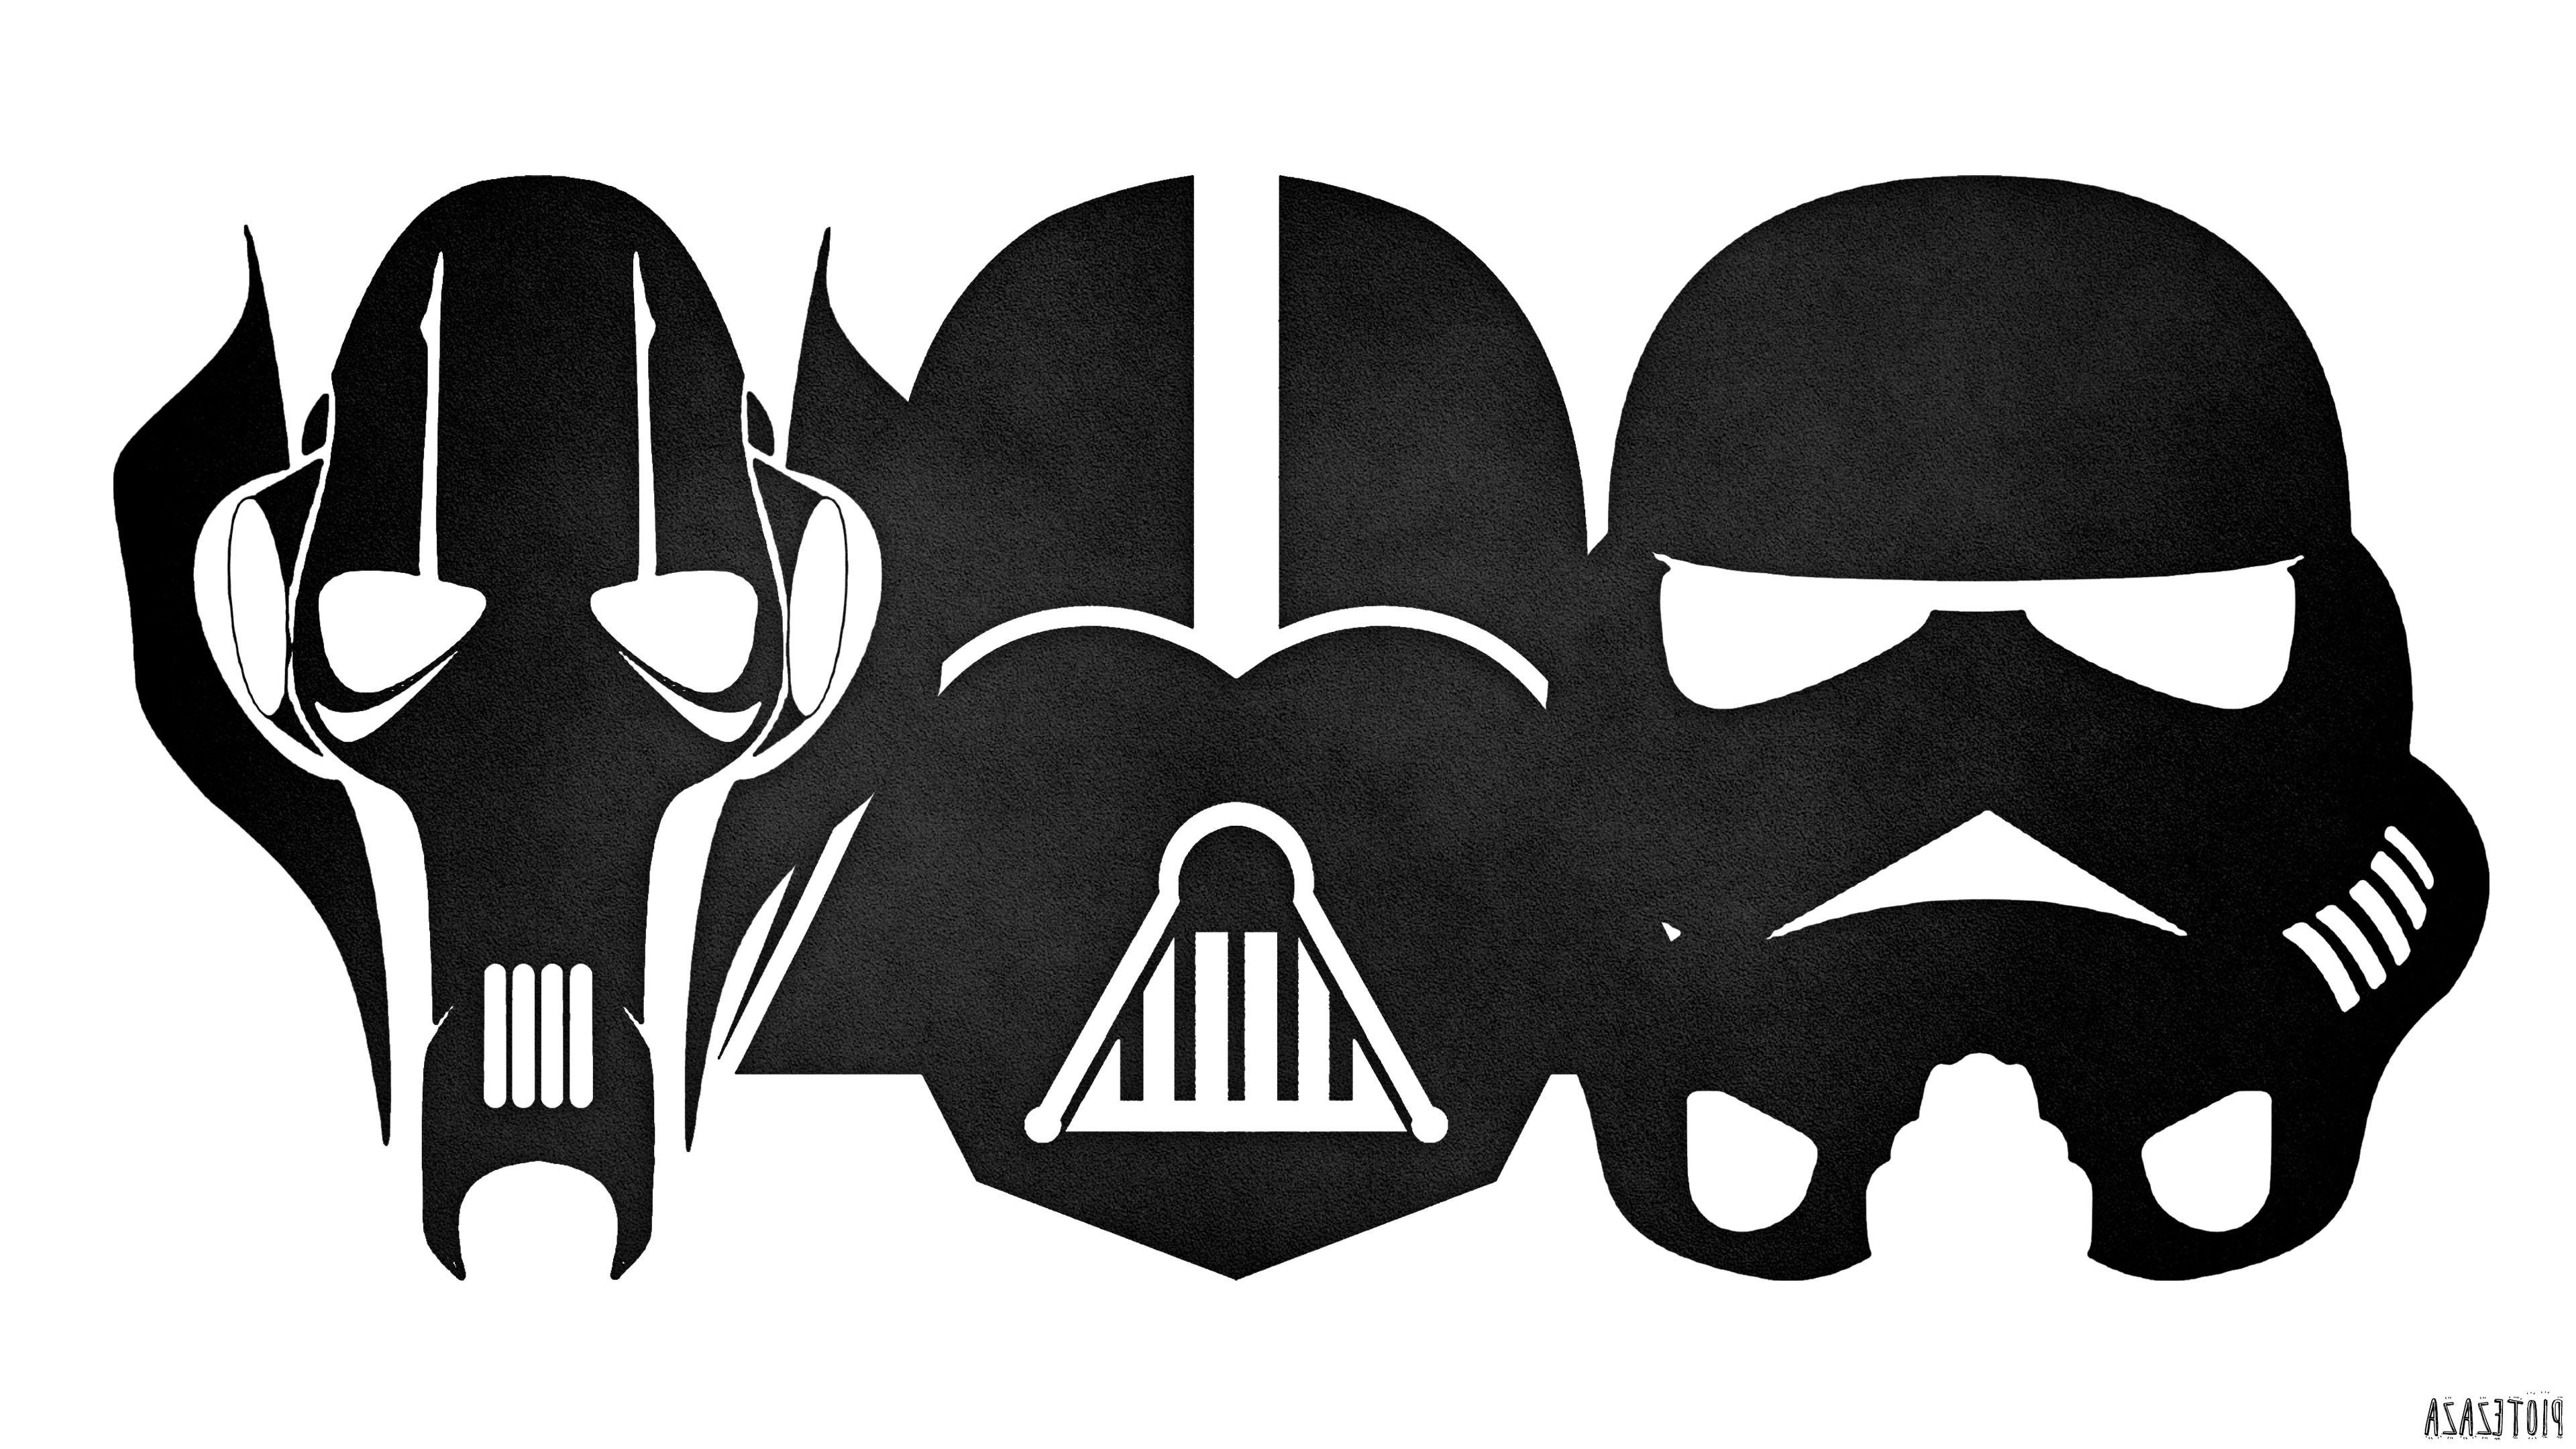 Wallpaper : colorful, illustration, Star Wars, minimalism